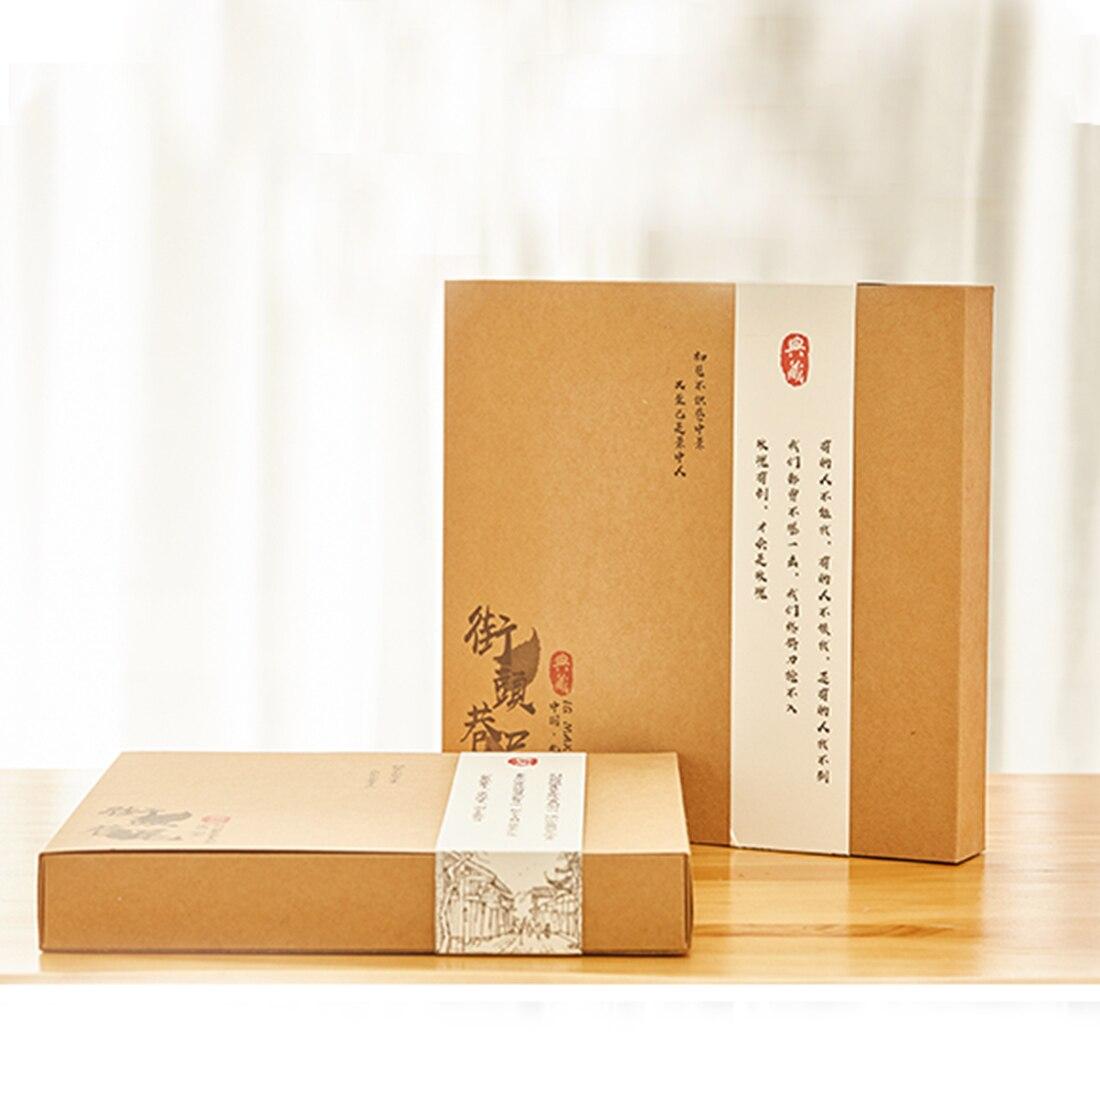 H727bef6149c8477aab919011677fdf67T - Robotime - DIY Models, DIY Miniature Houses, 3d Wooden Puzzle